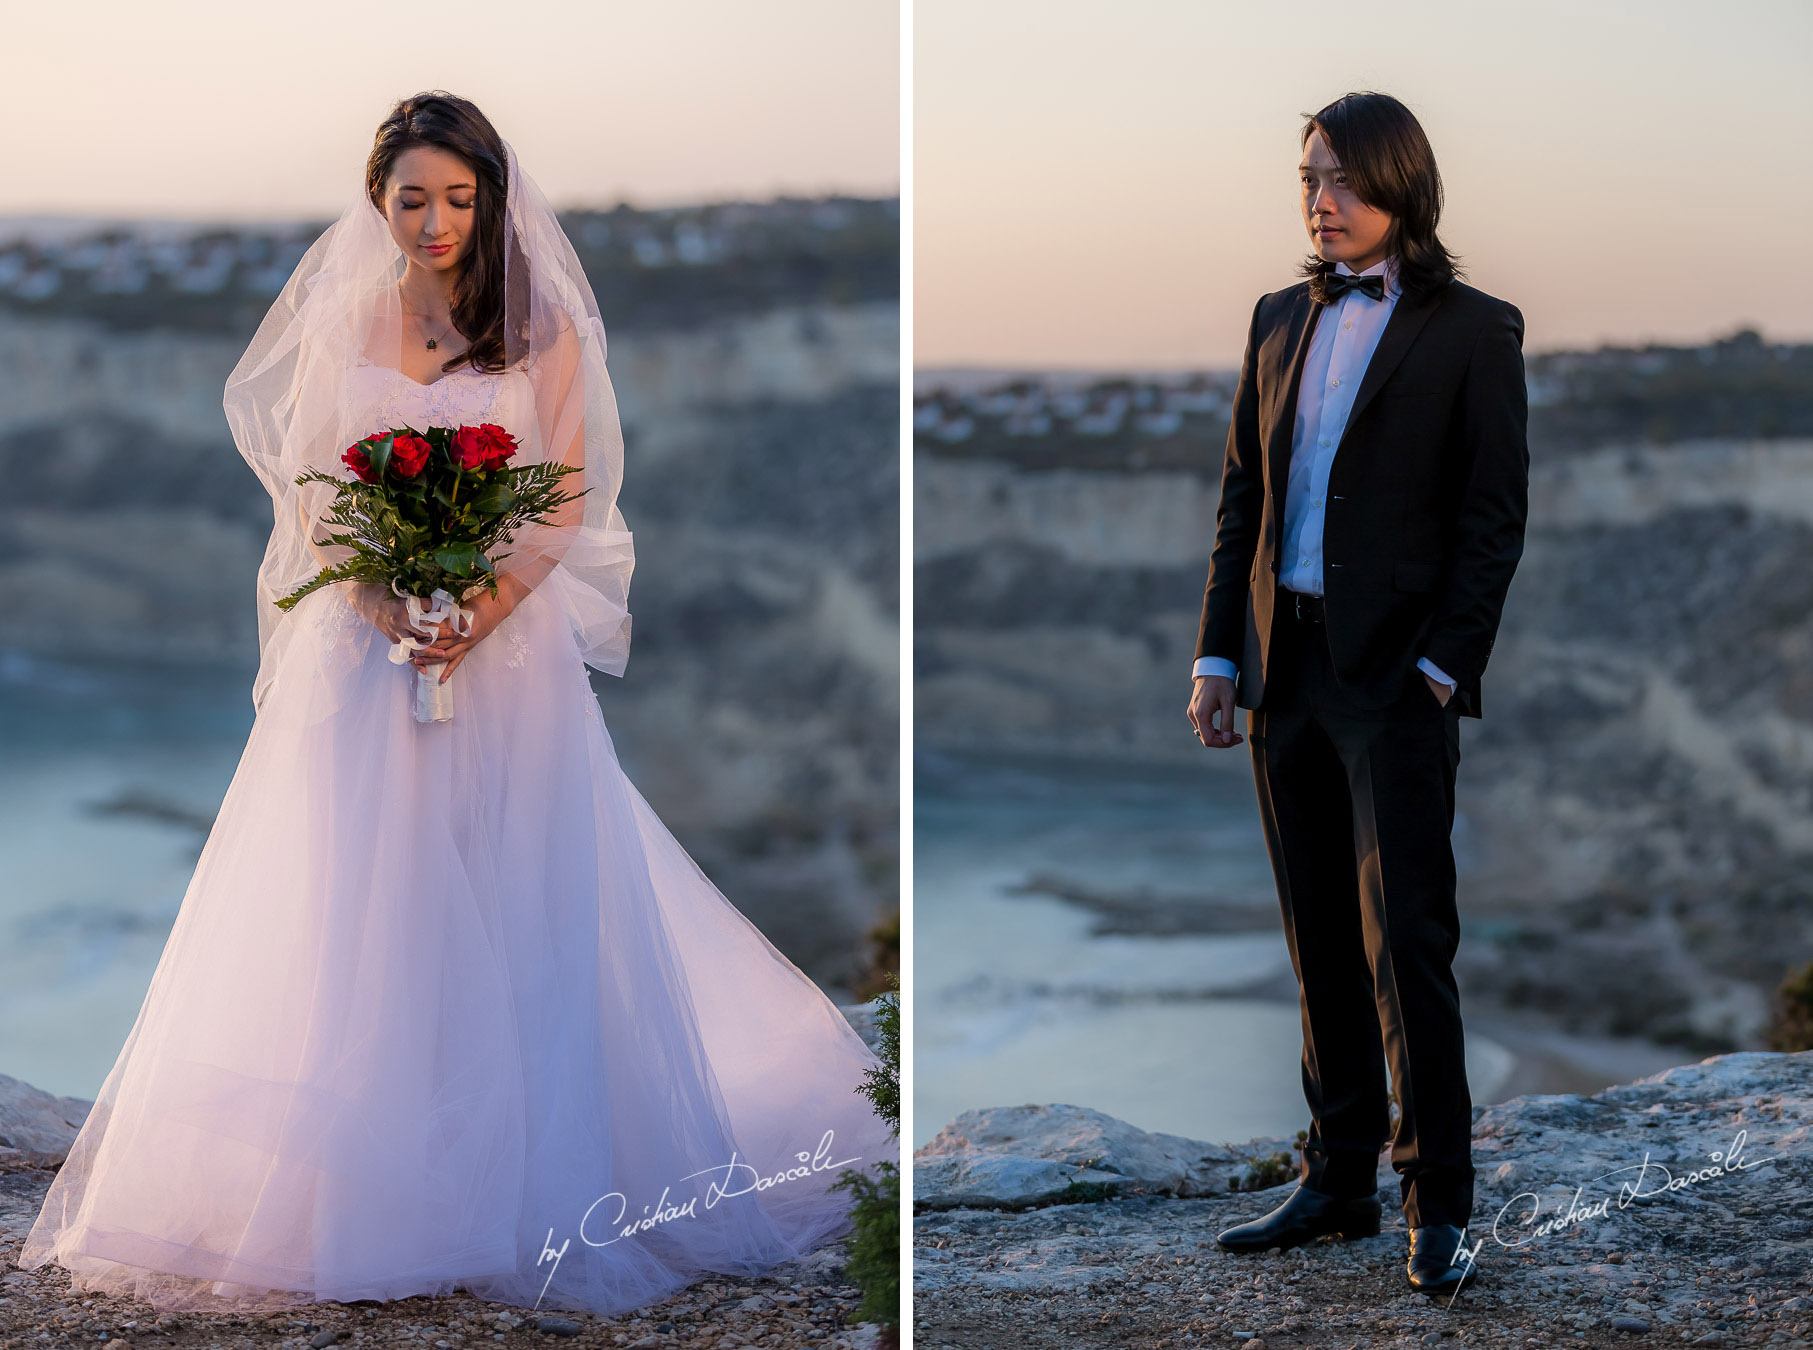 Pre Wedding Photoshoot in Cyprus - 13